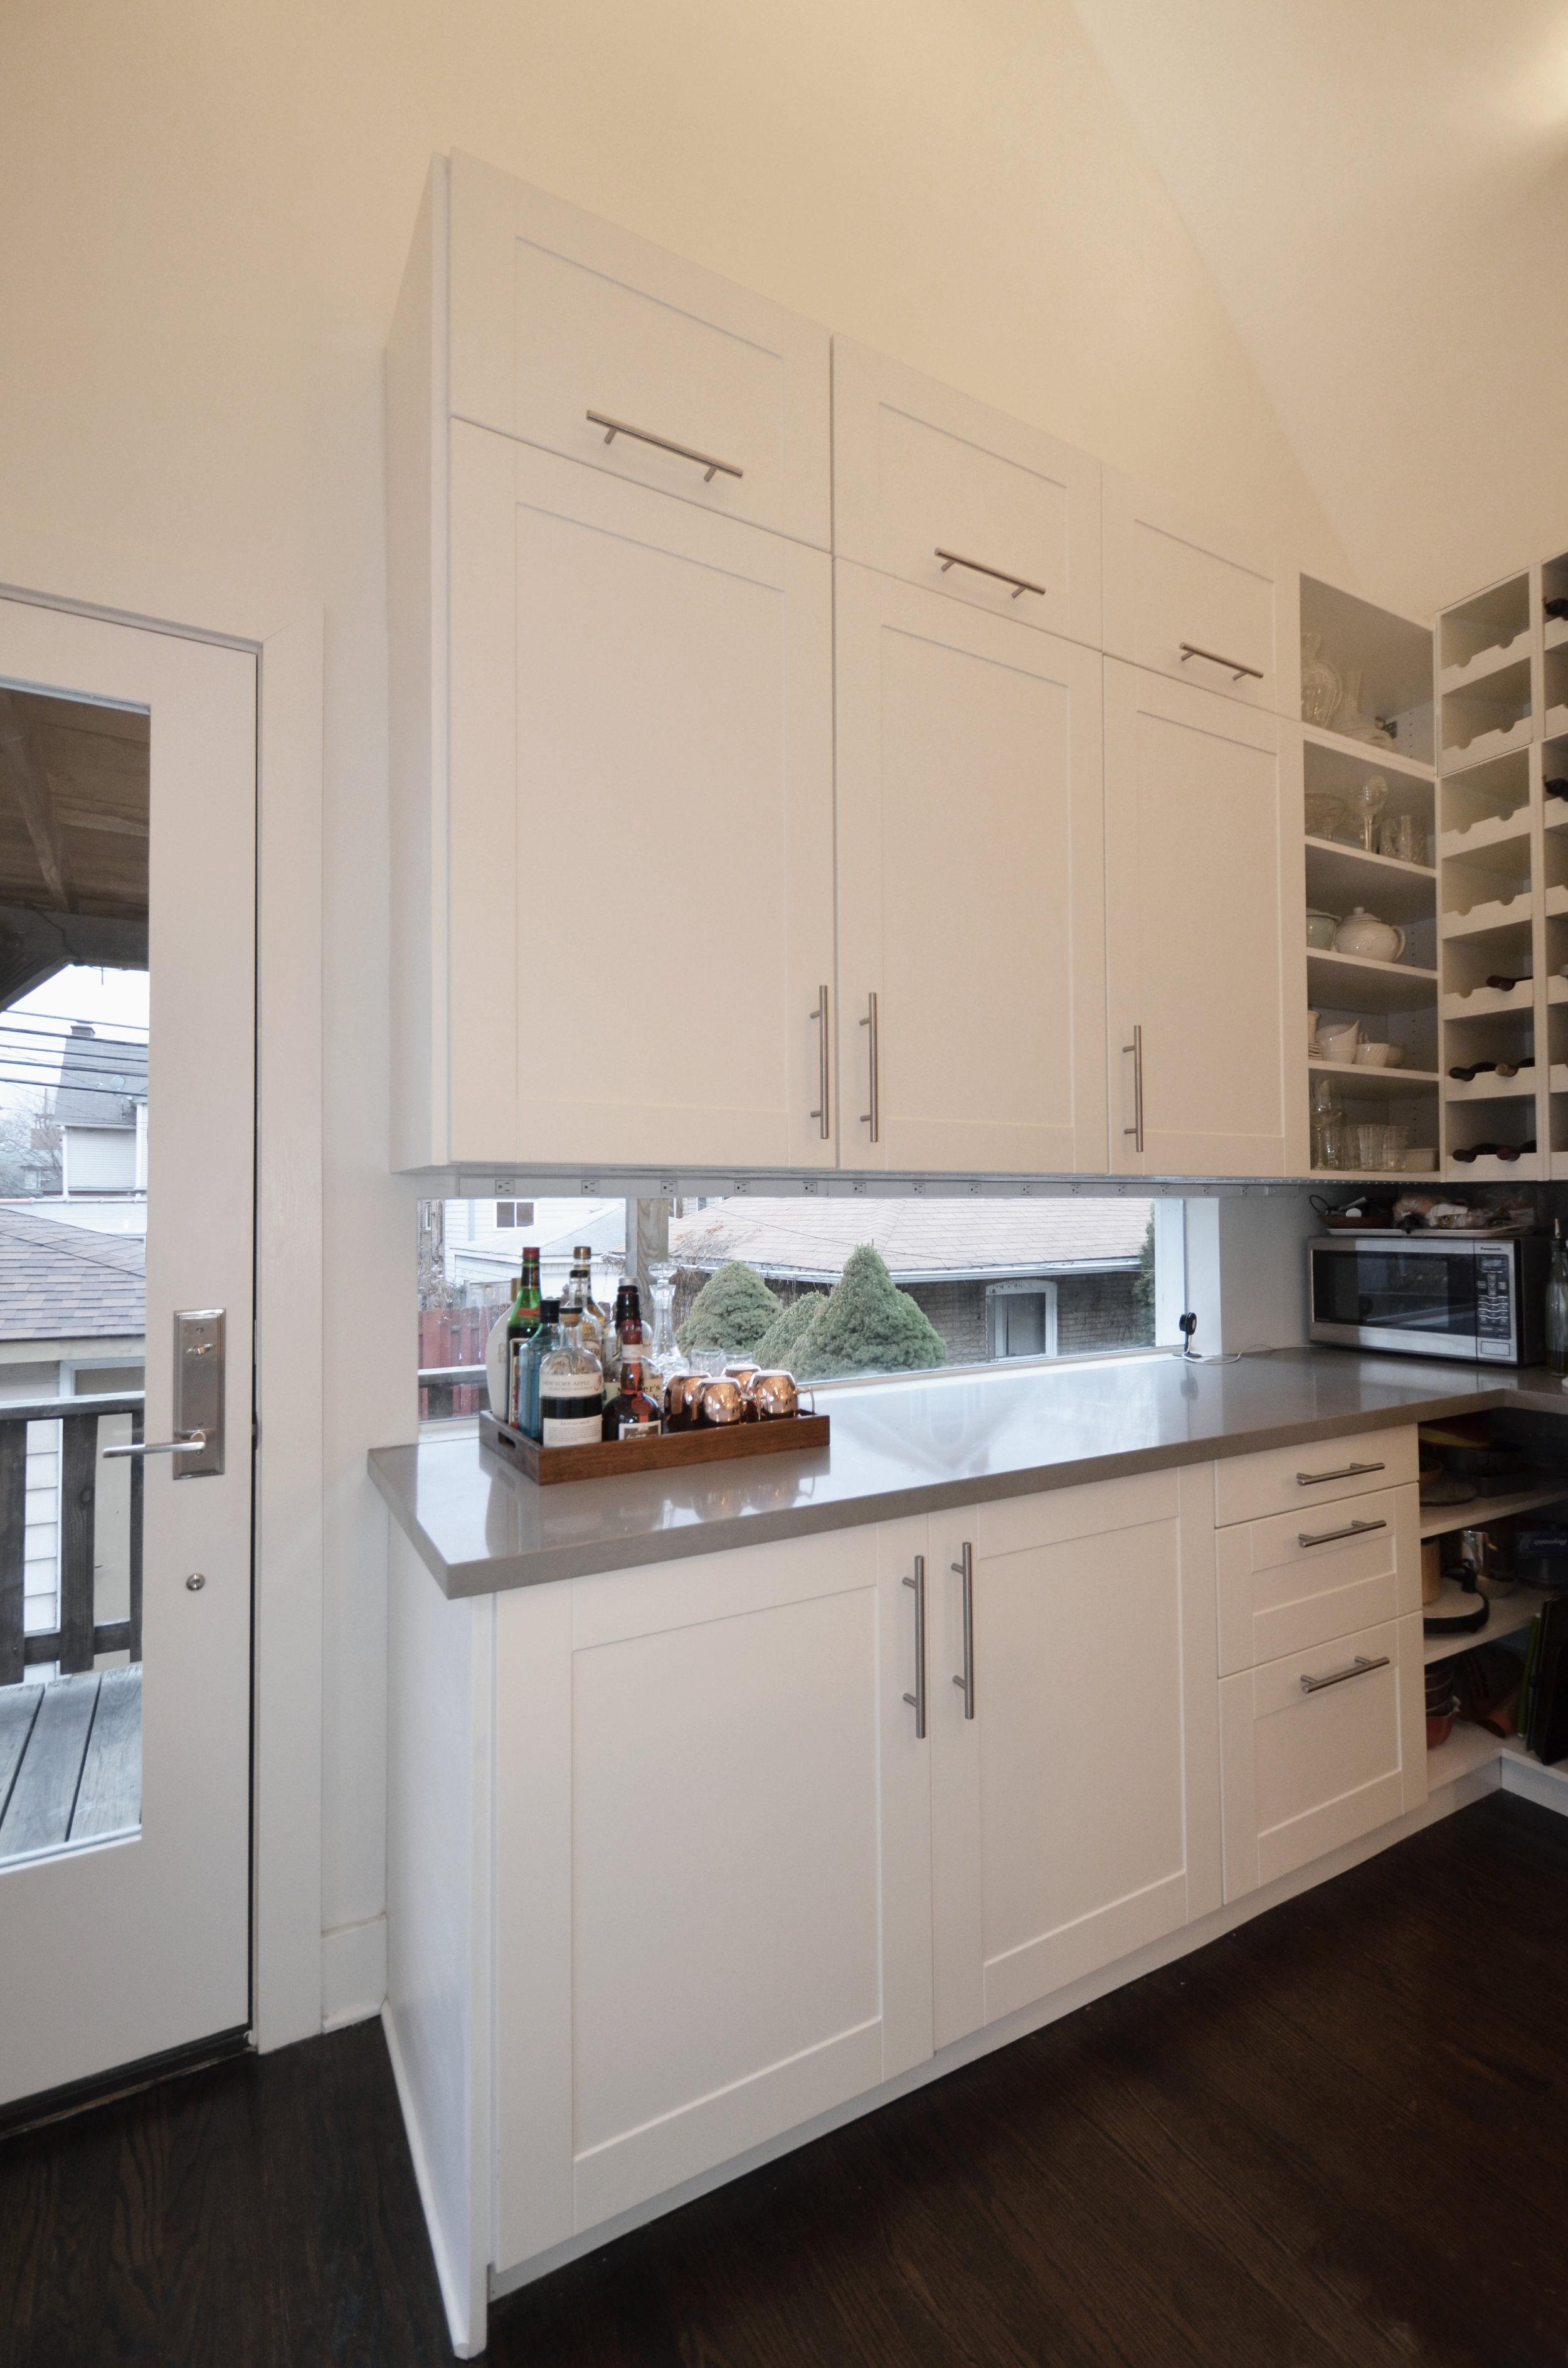 view of kitchen glass backsplash